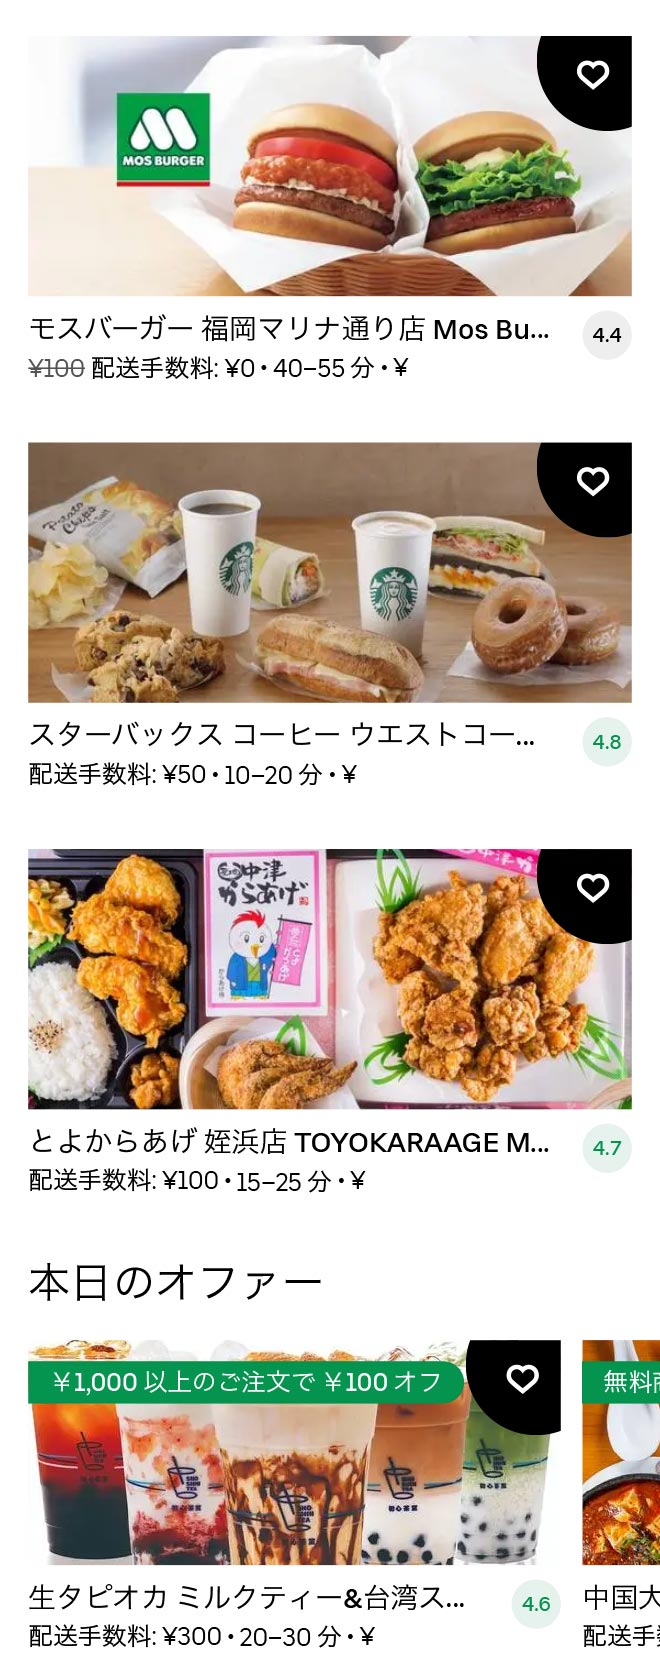 Meinohama menu 2101 02